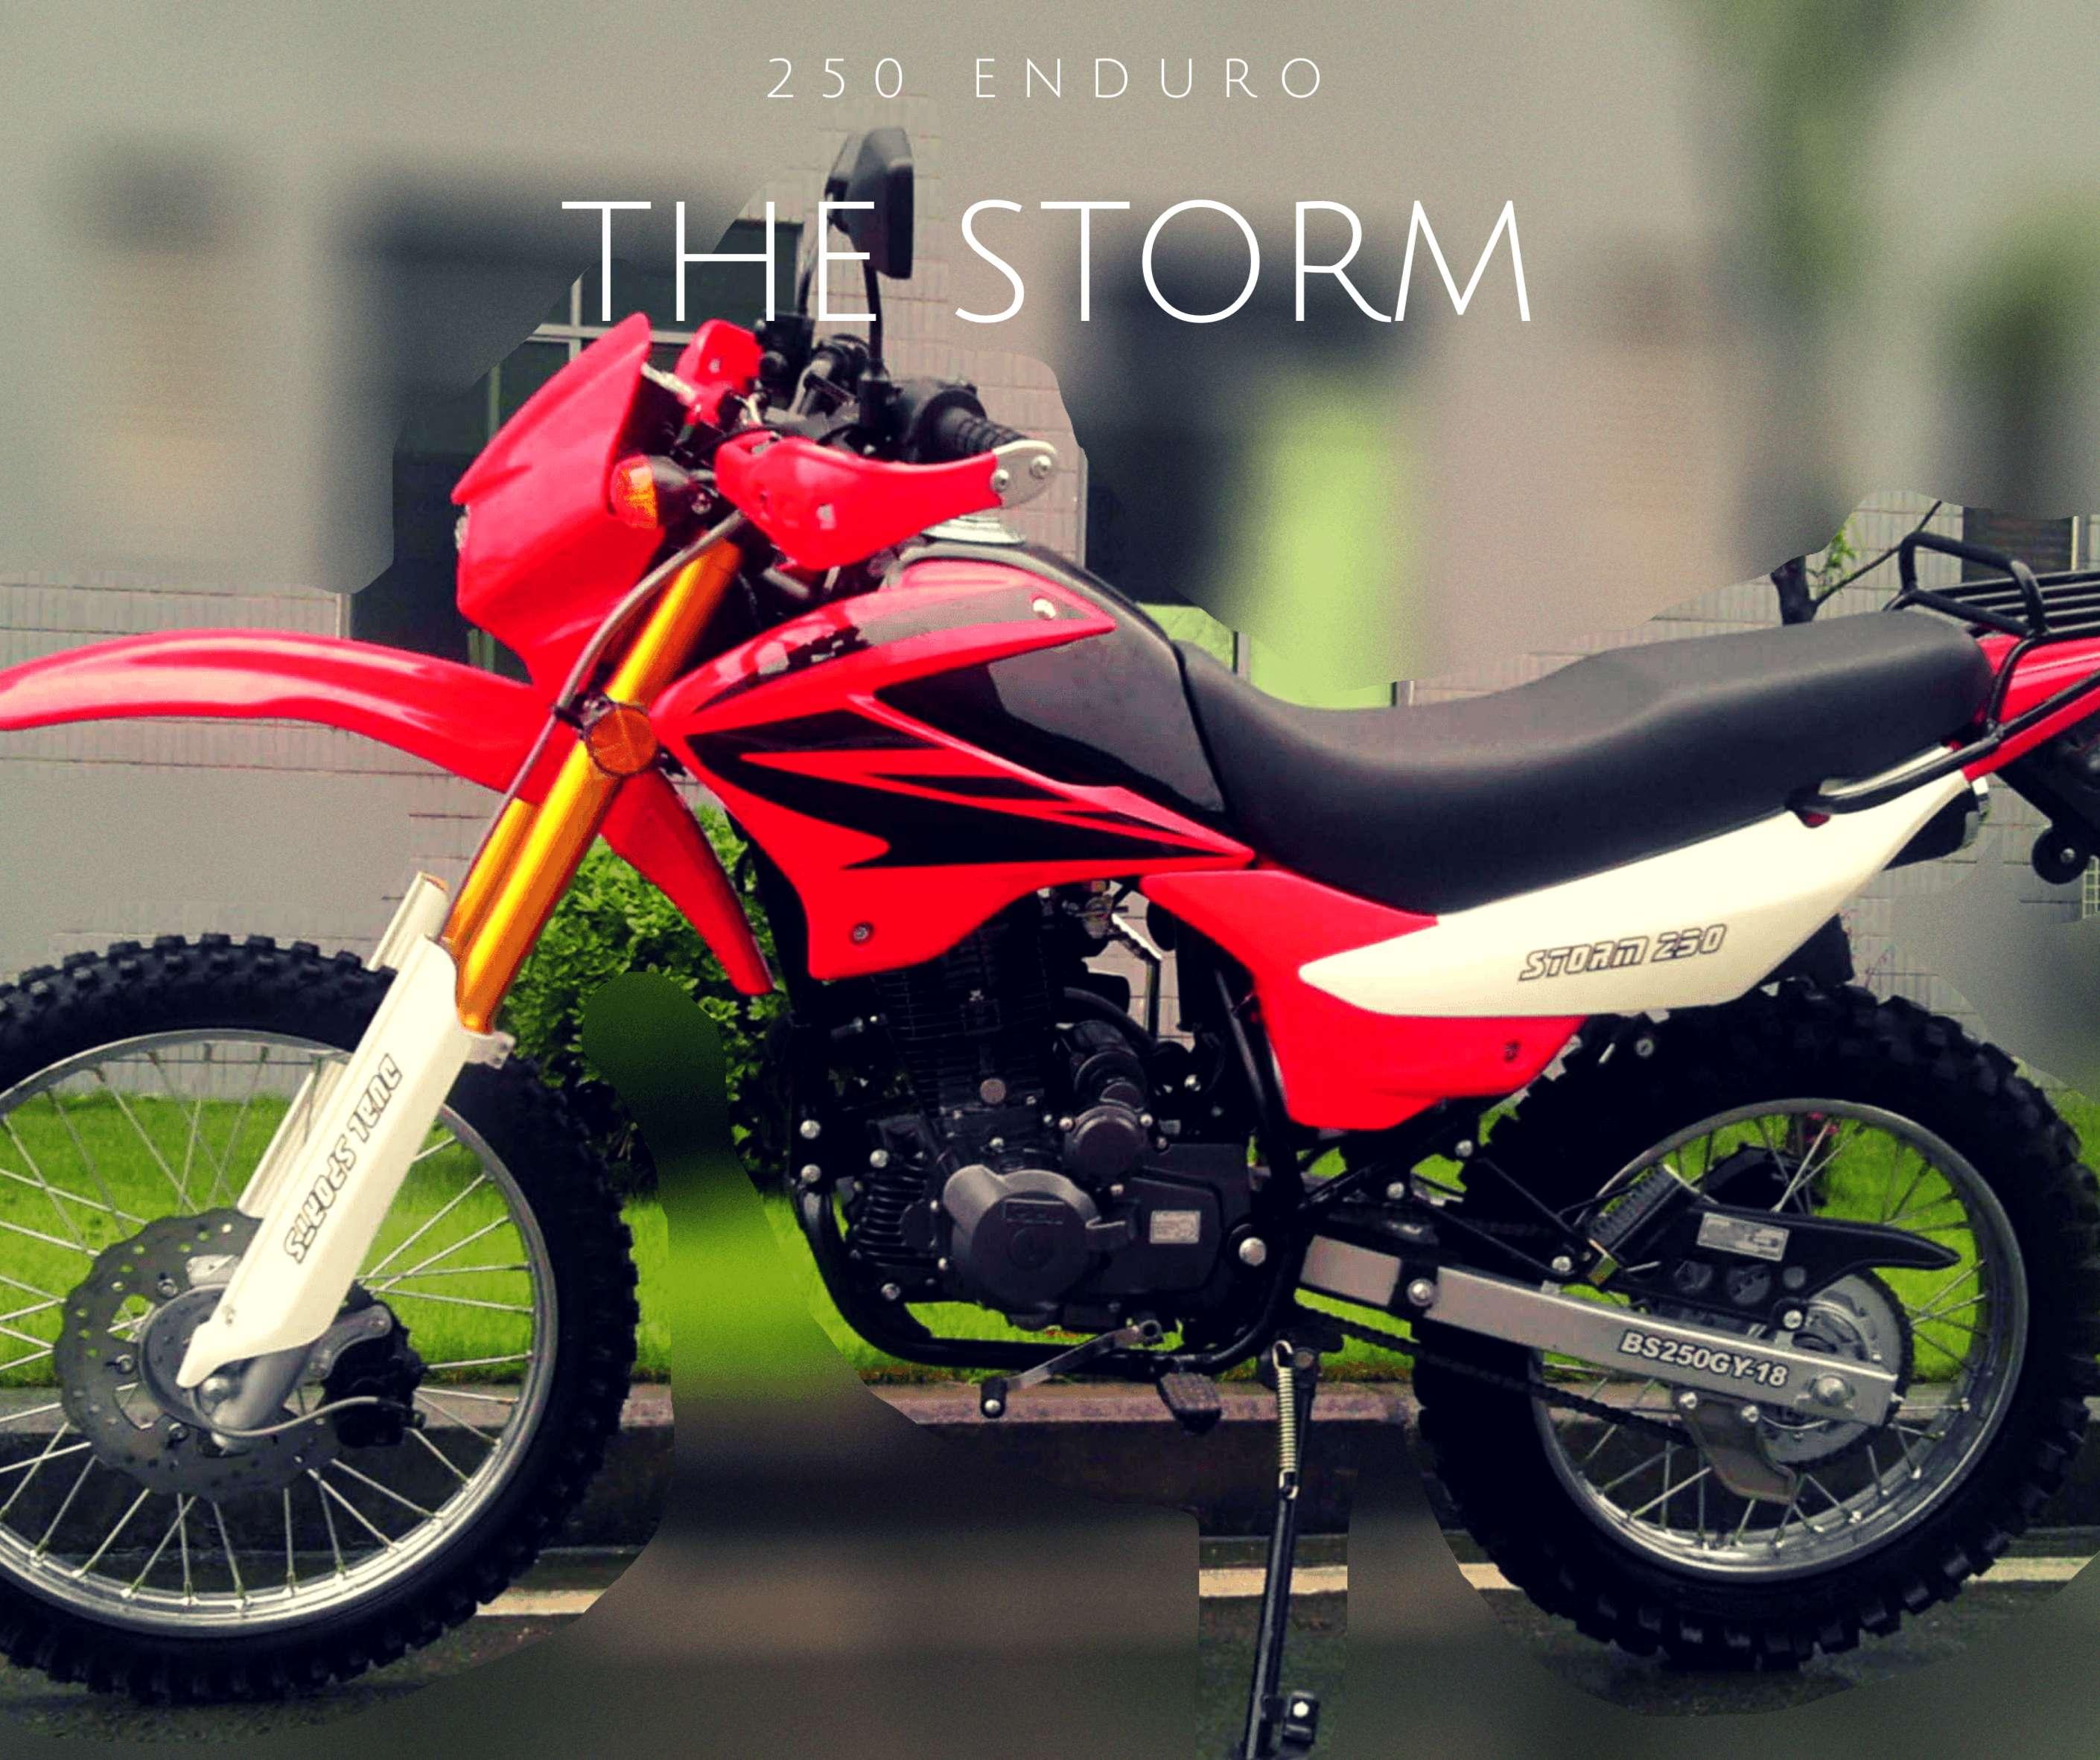 Bashan Storm Enduro Motorcycle 250cc